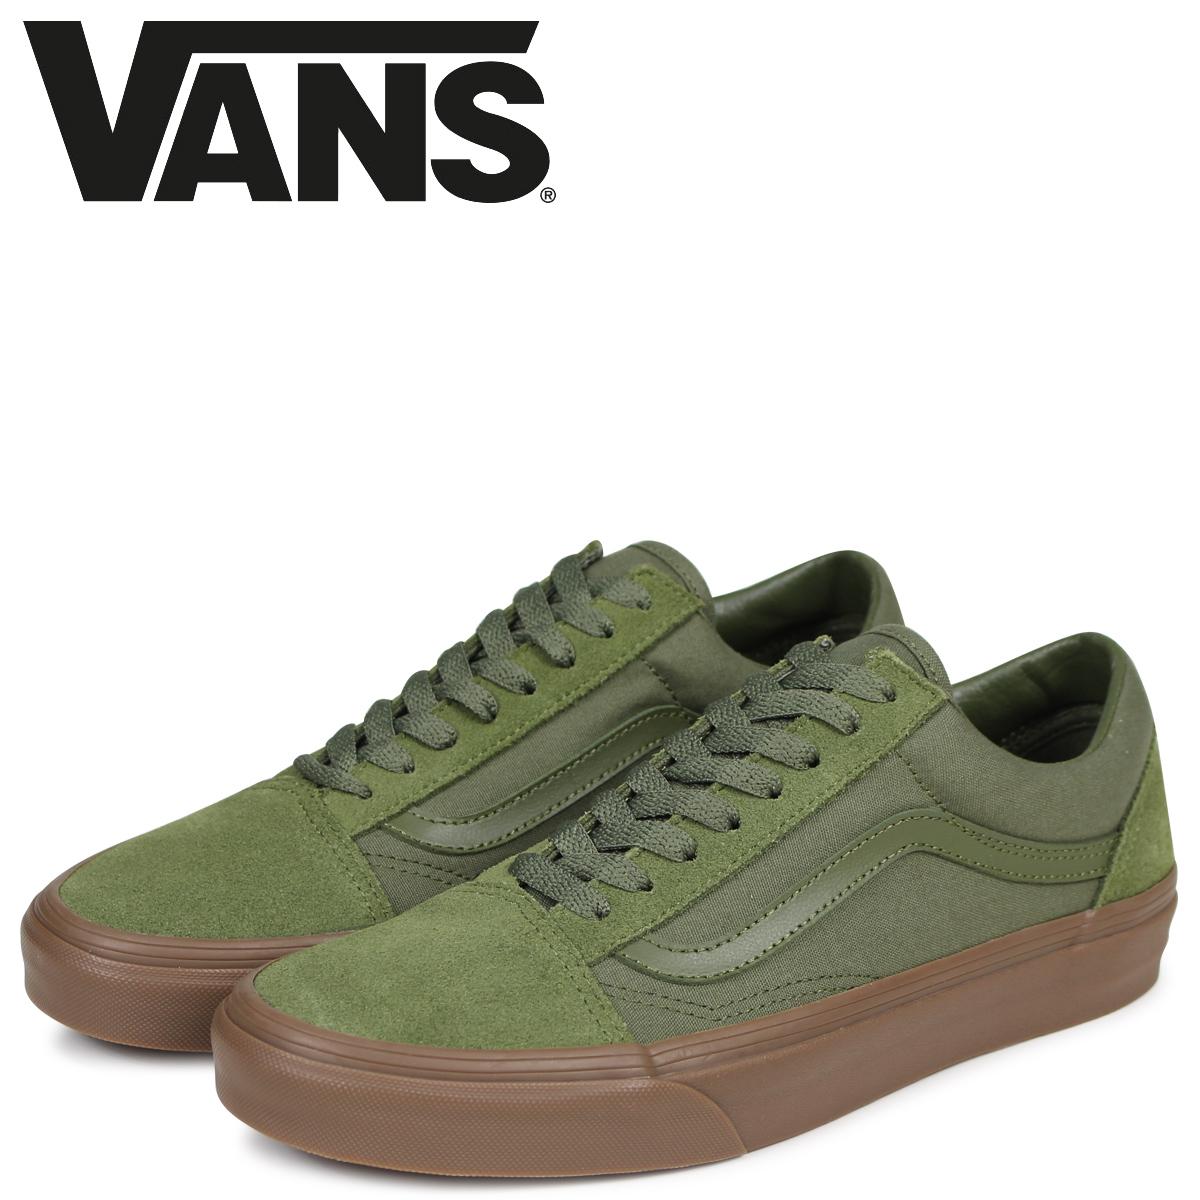 Station Old Sneakers Olive Vans School Men Wagons Vn0a38g1qw4 Skool TlFK1cJ